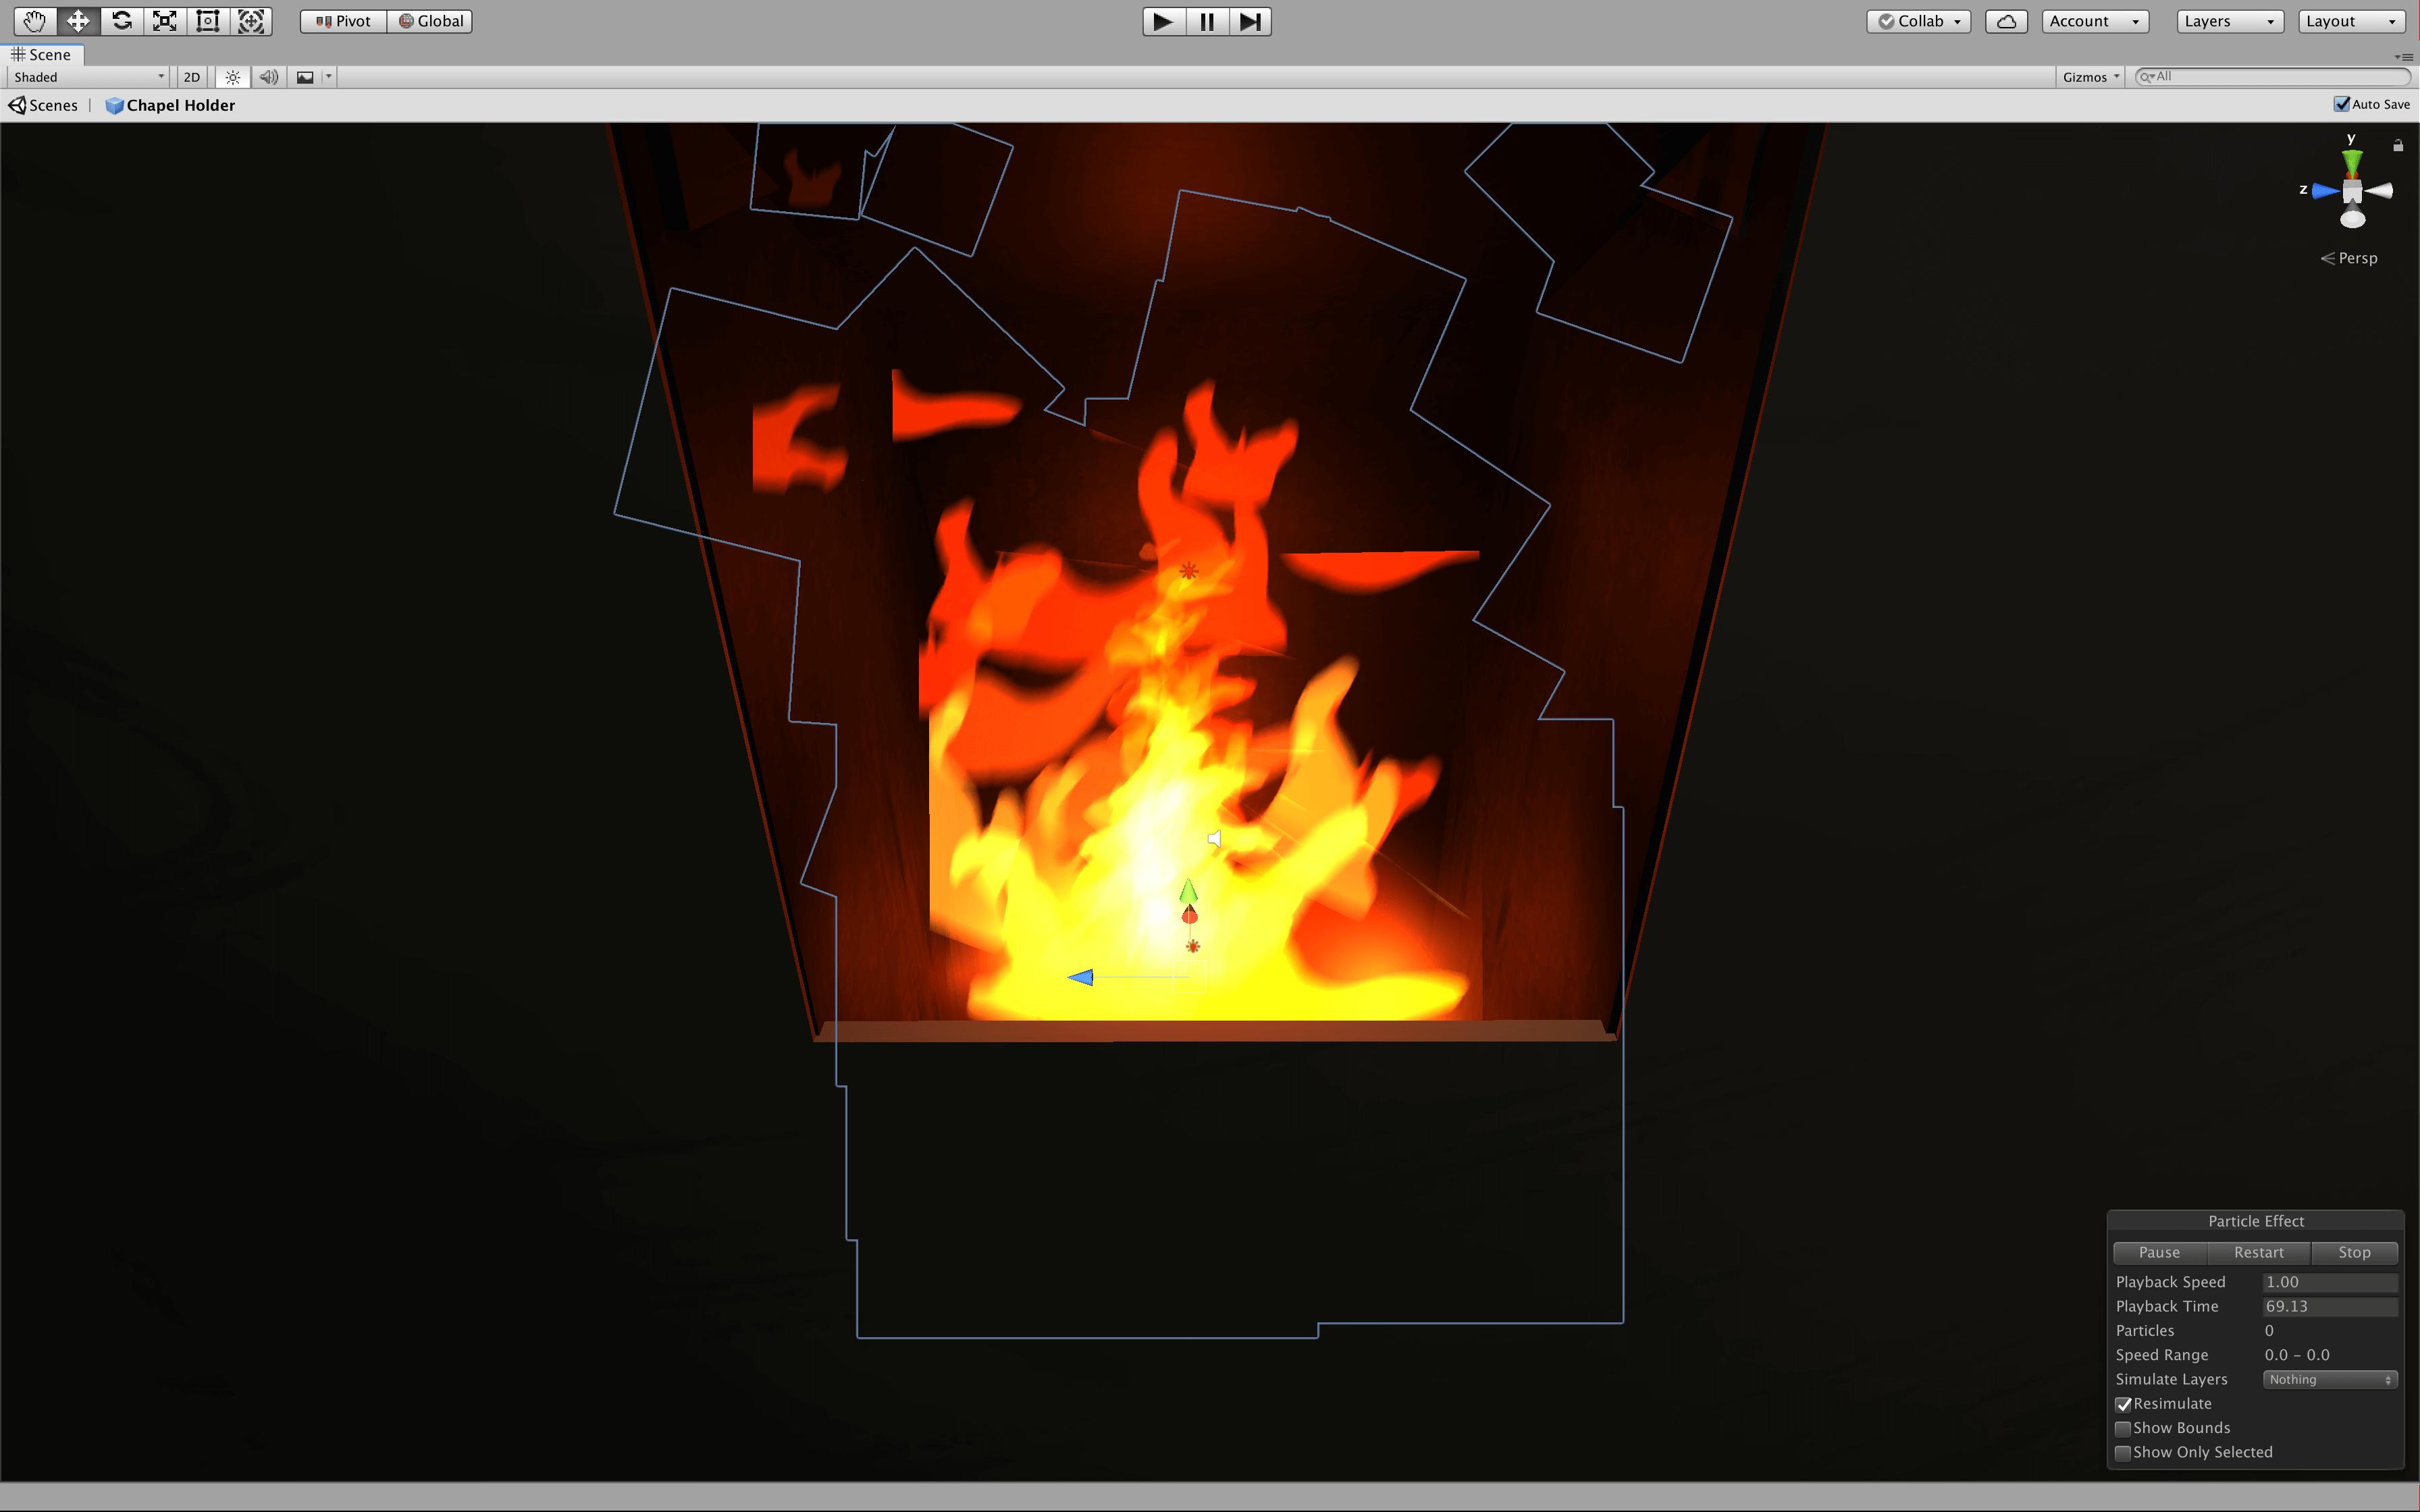 Apple Chapel Unity Fire Screenshot | Toby Everett